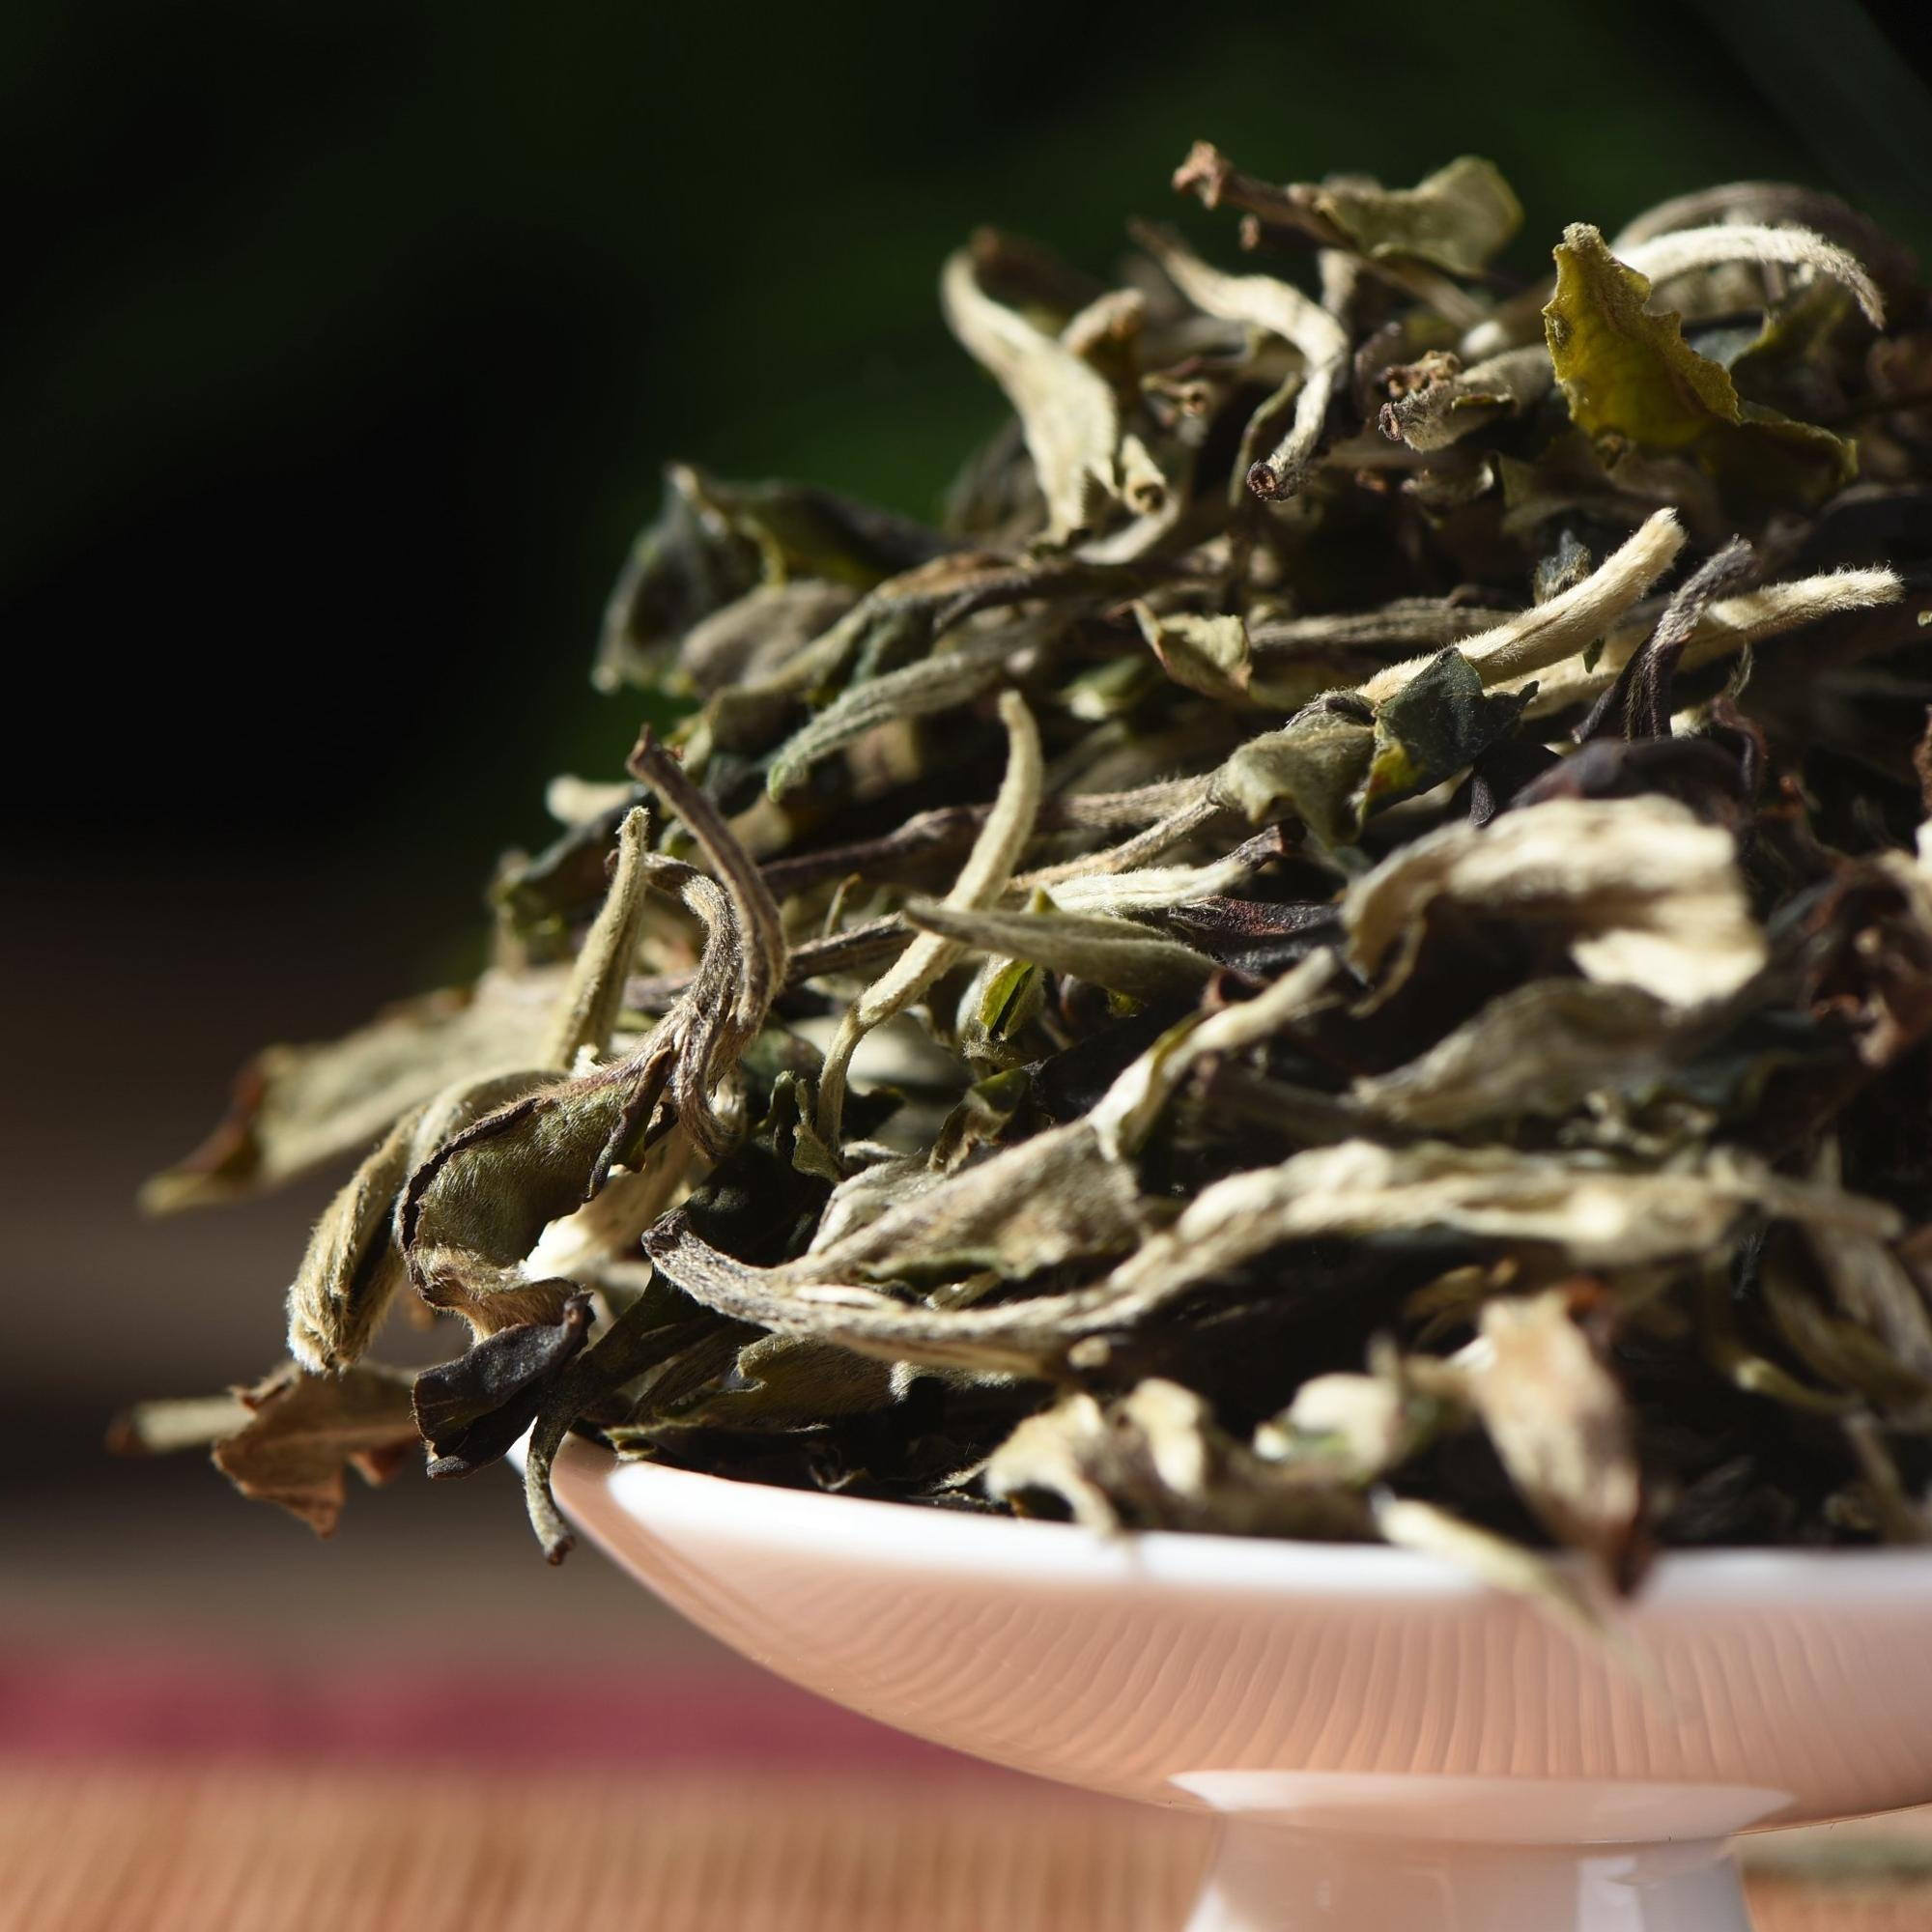 Yunnan highmountain arbor terrace tea moonlight loose leaf white tea - 4uTea | 4uTea.com